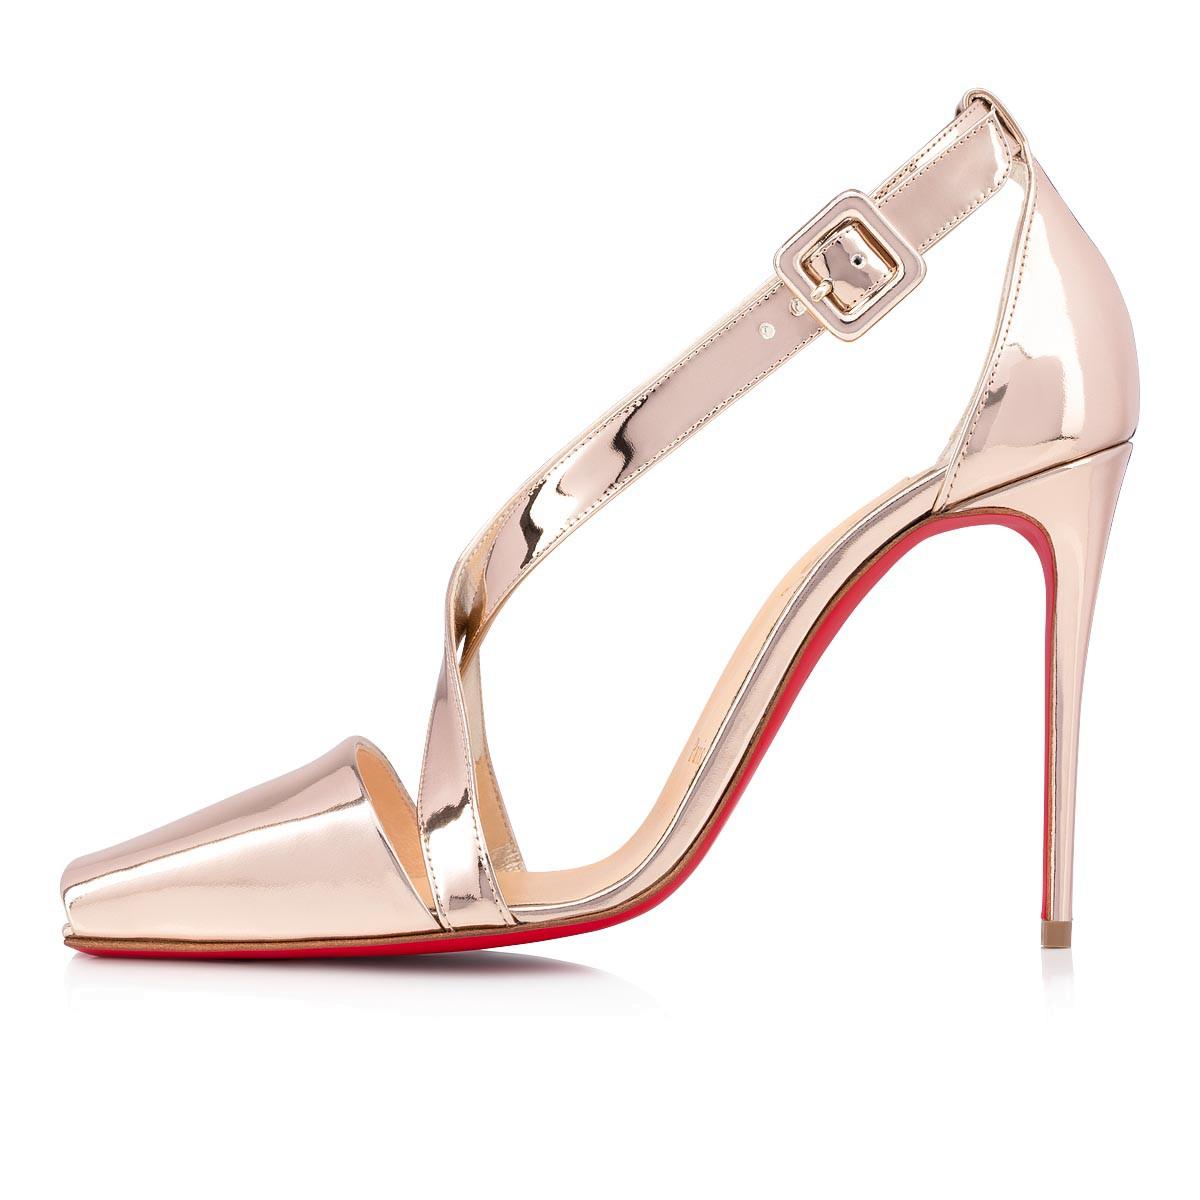 Shoes - Ambretta Cross - Christian Louboutin